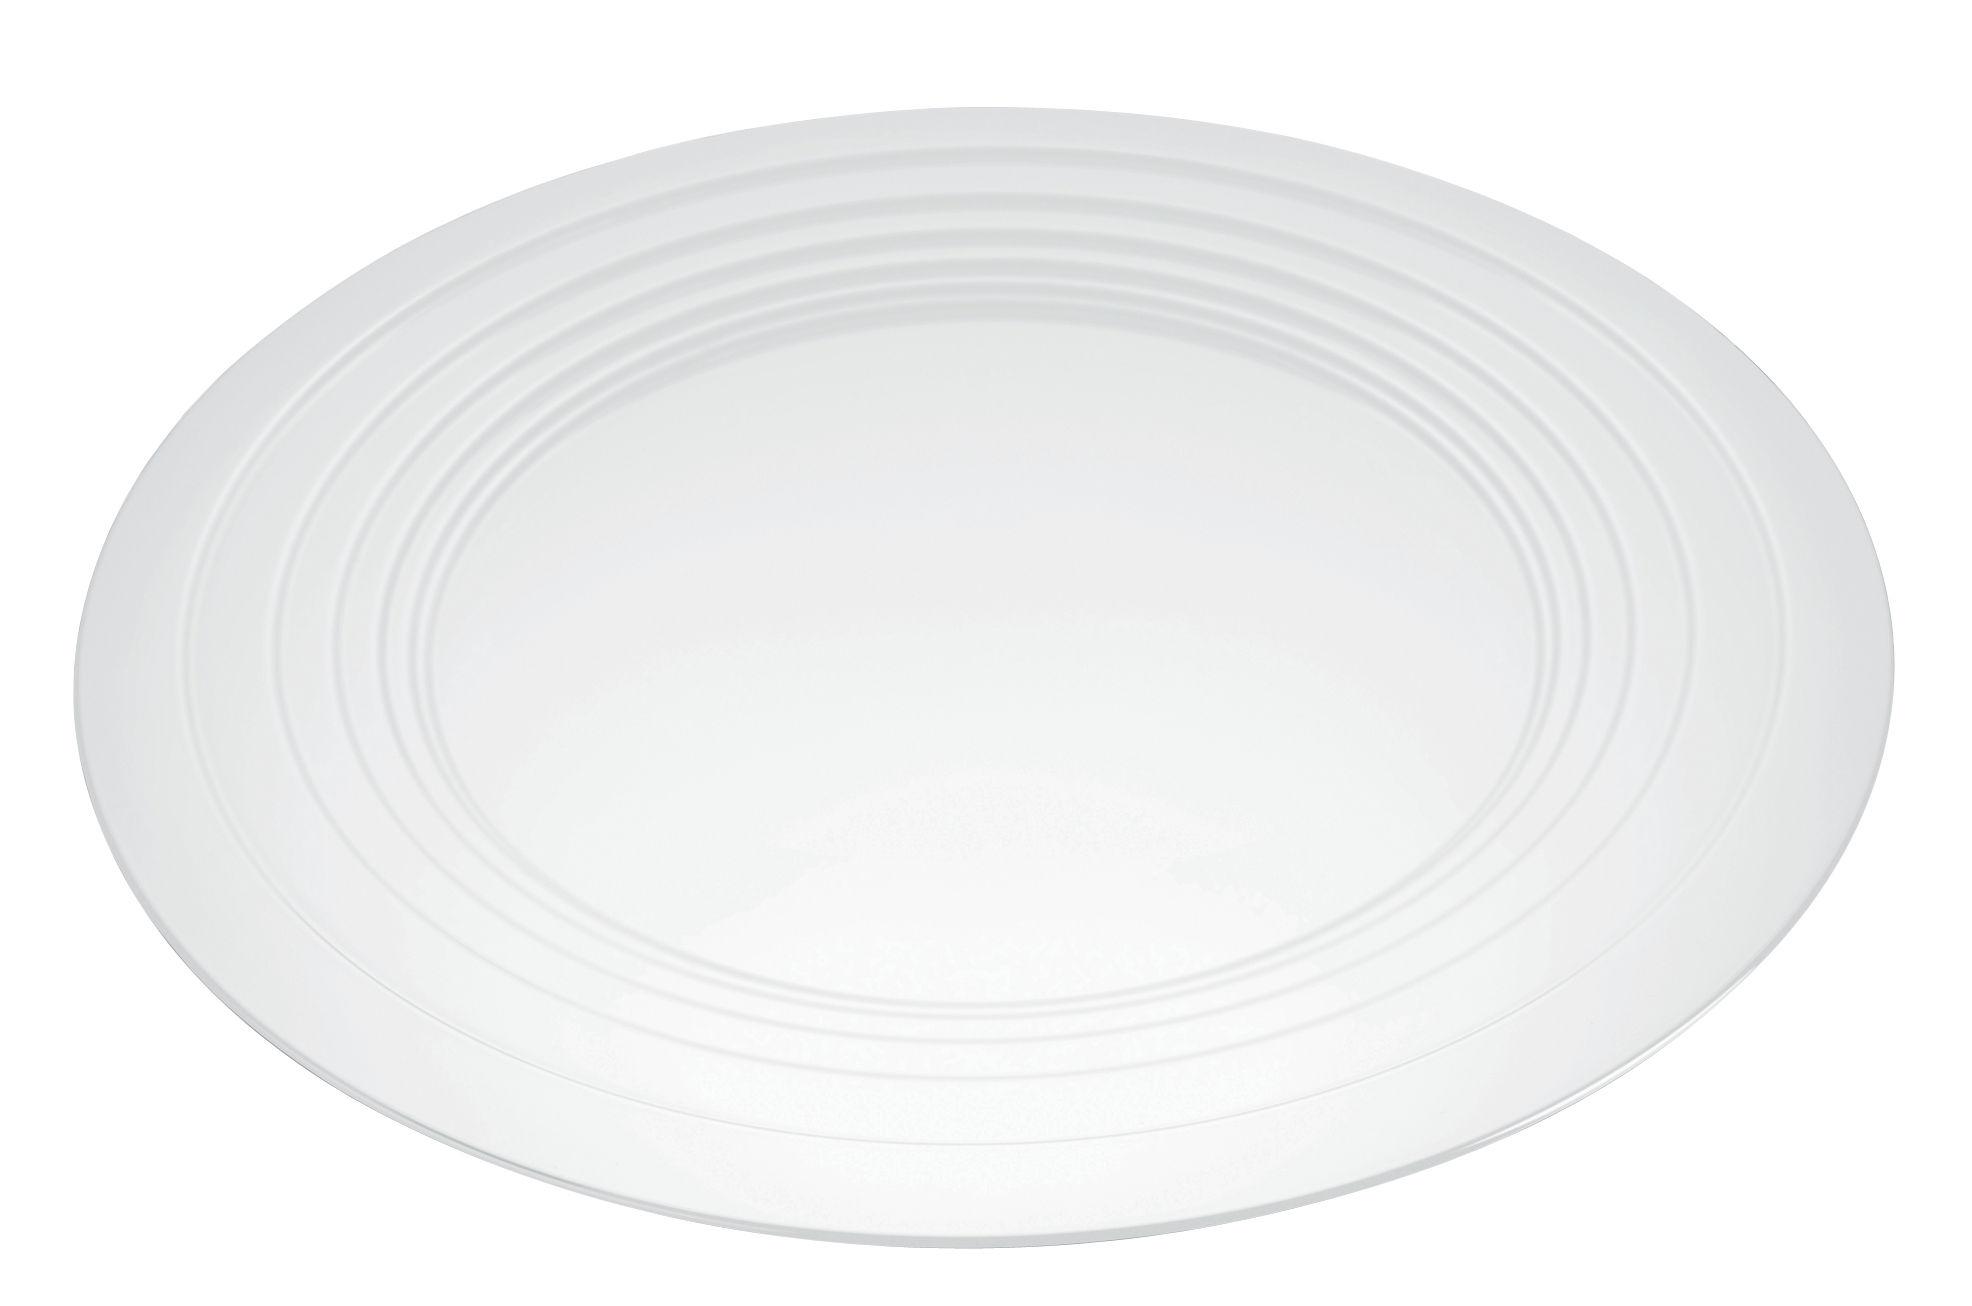 Tavola - Vassoi  - Vassoio Le Cerchie / Centrotavola - Ø 48 cm - Alessi - Bianco - Acier laqué époxy